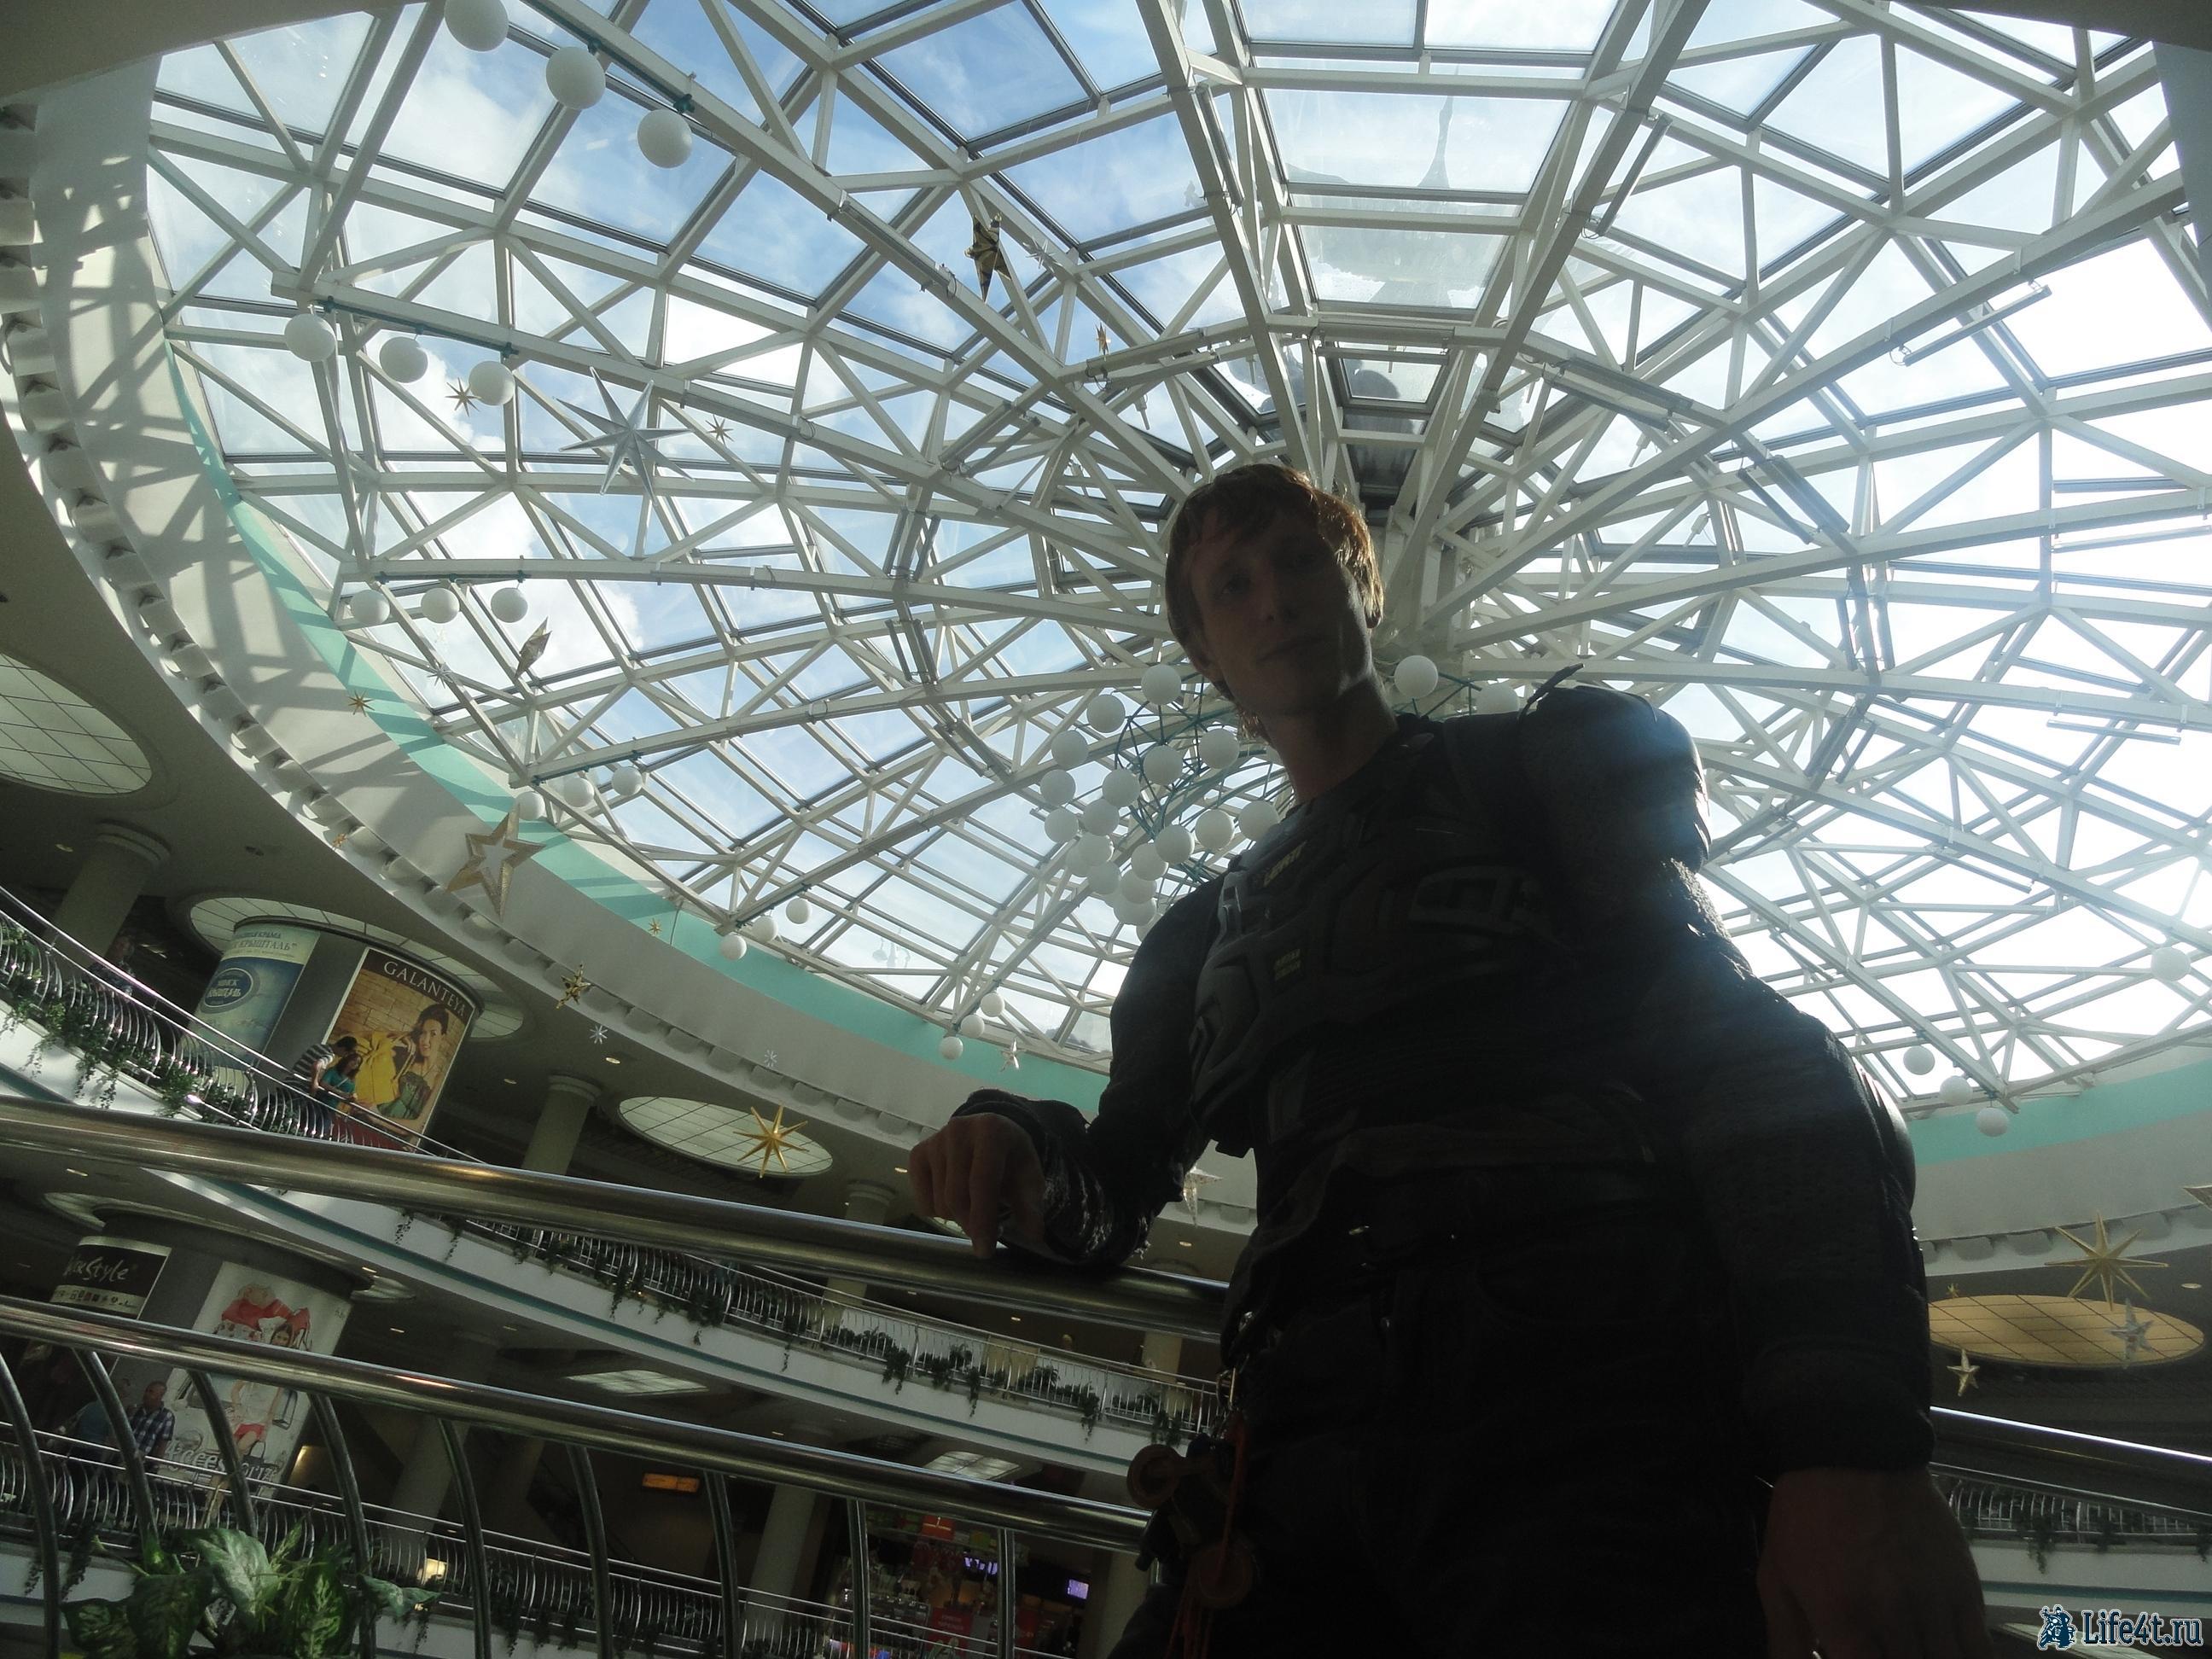 Мотопутешествие 2014 Россия, Казахстан, Абхазия, Беларусь